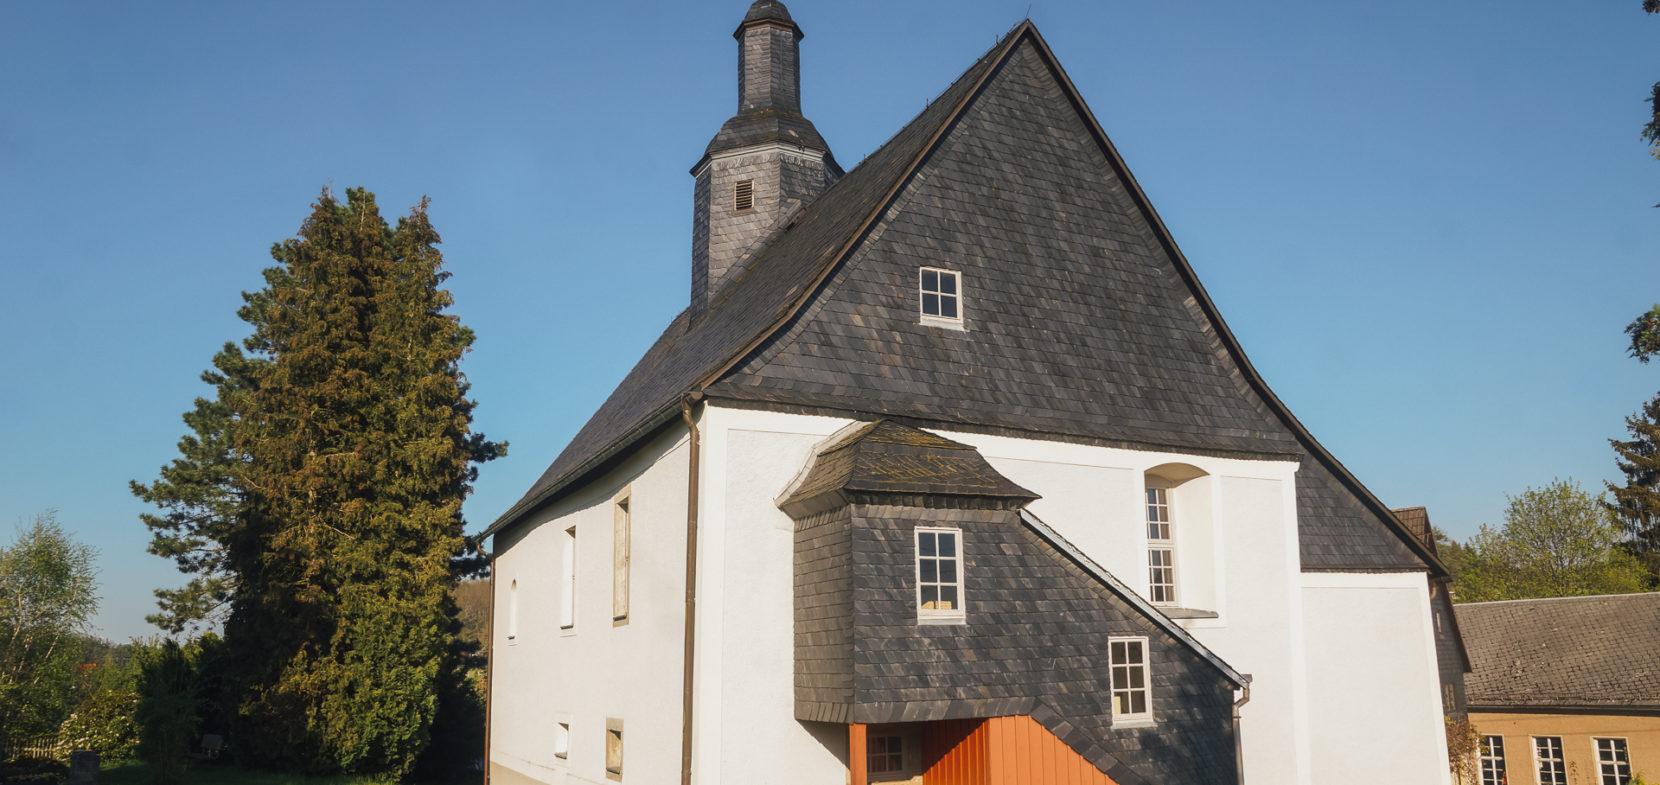 St.-Michaeliskirche Niedercrinitz